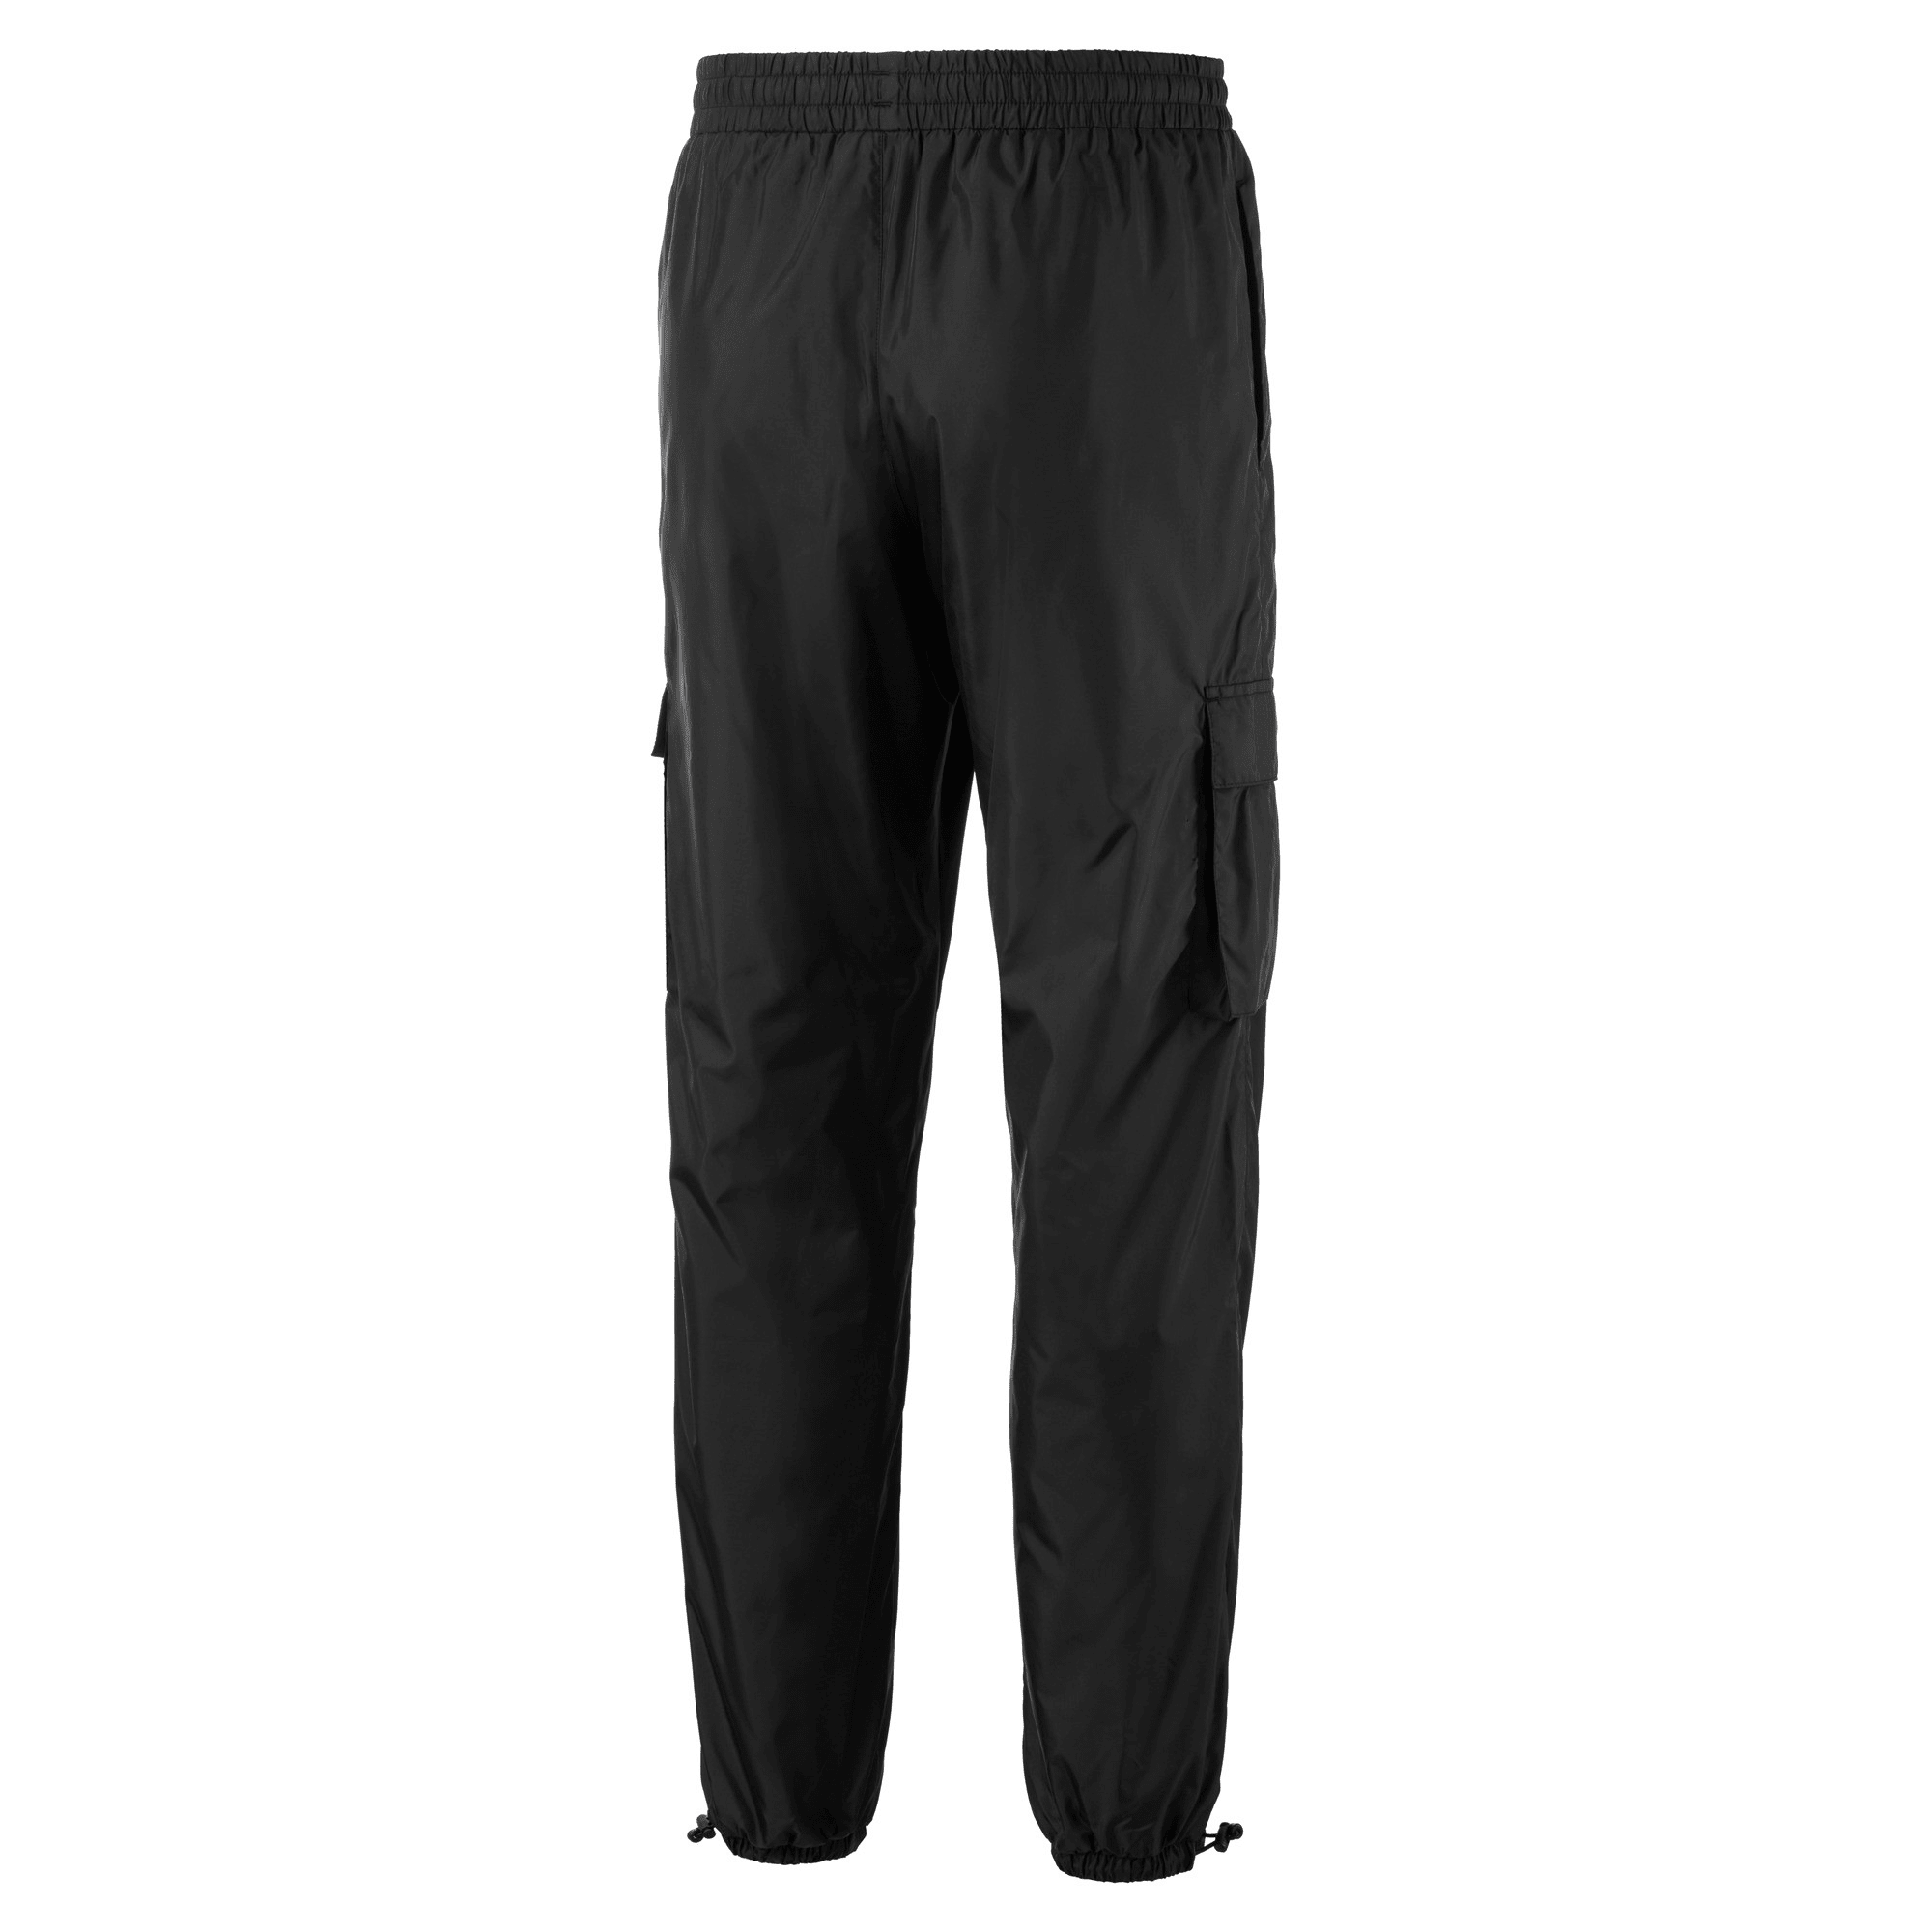 Thumbnail 2 of Lightweight Woven Men's Pants, Puma Black, medium